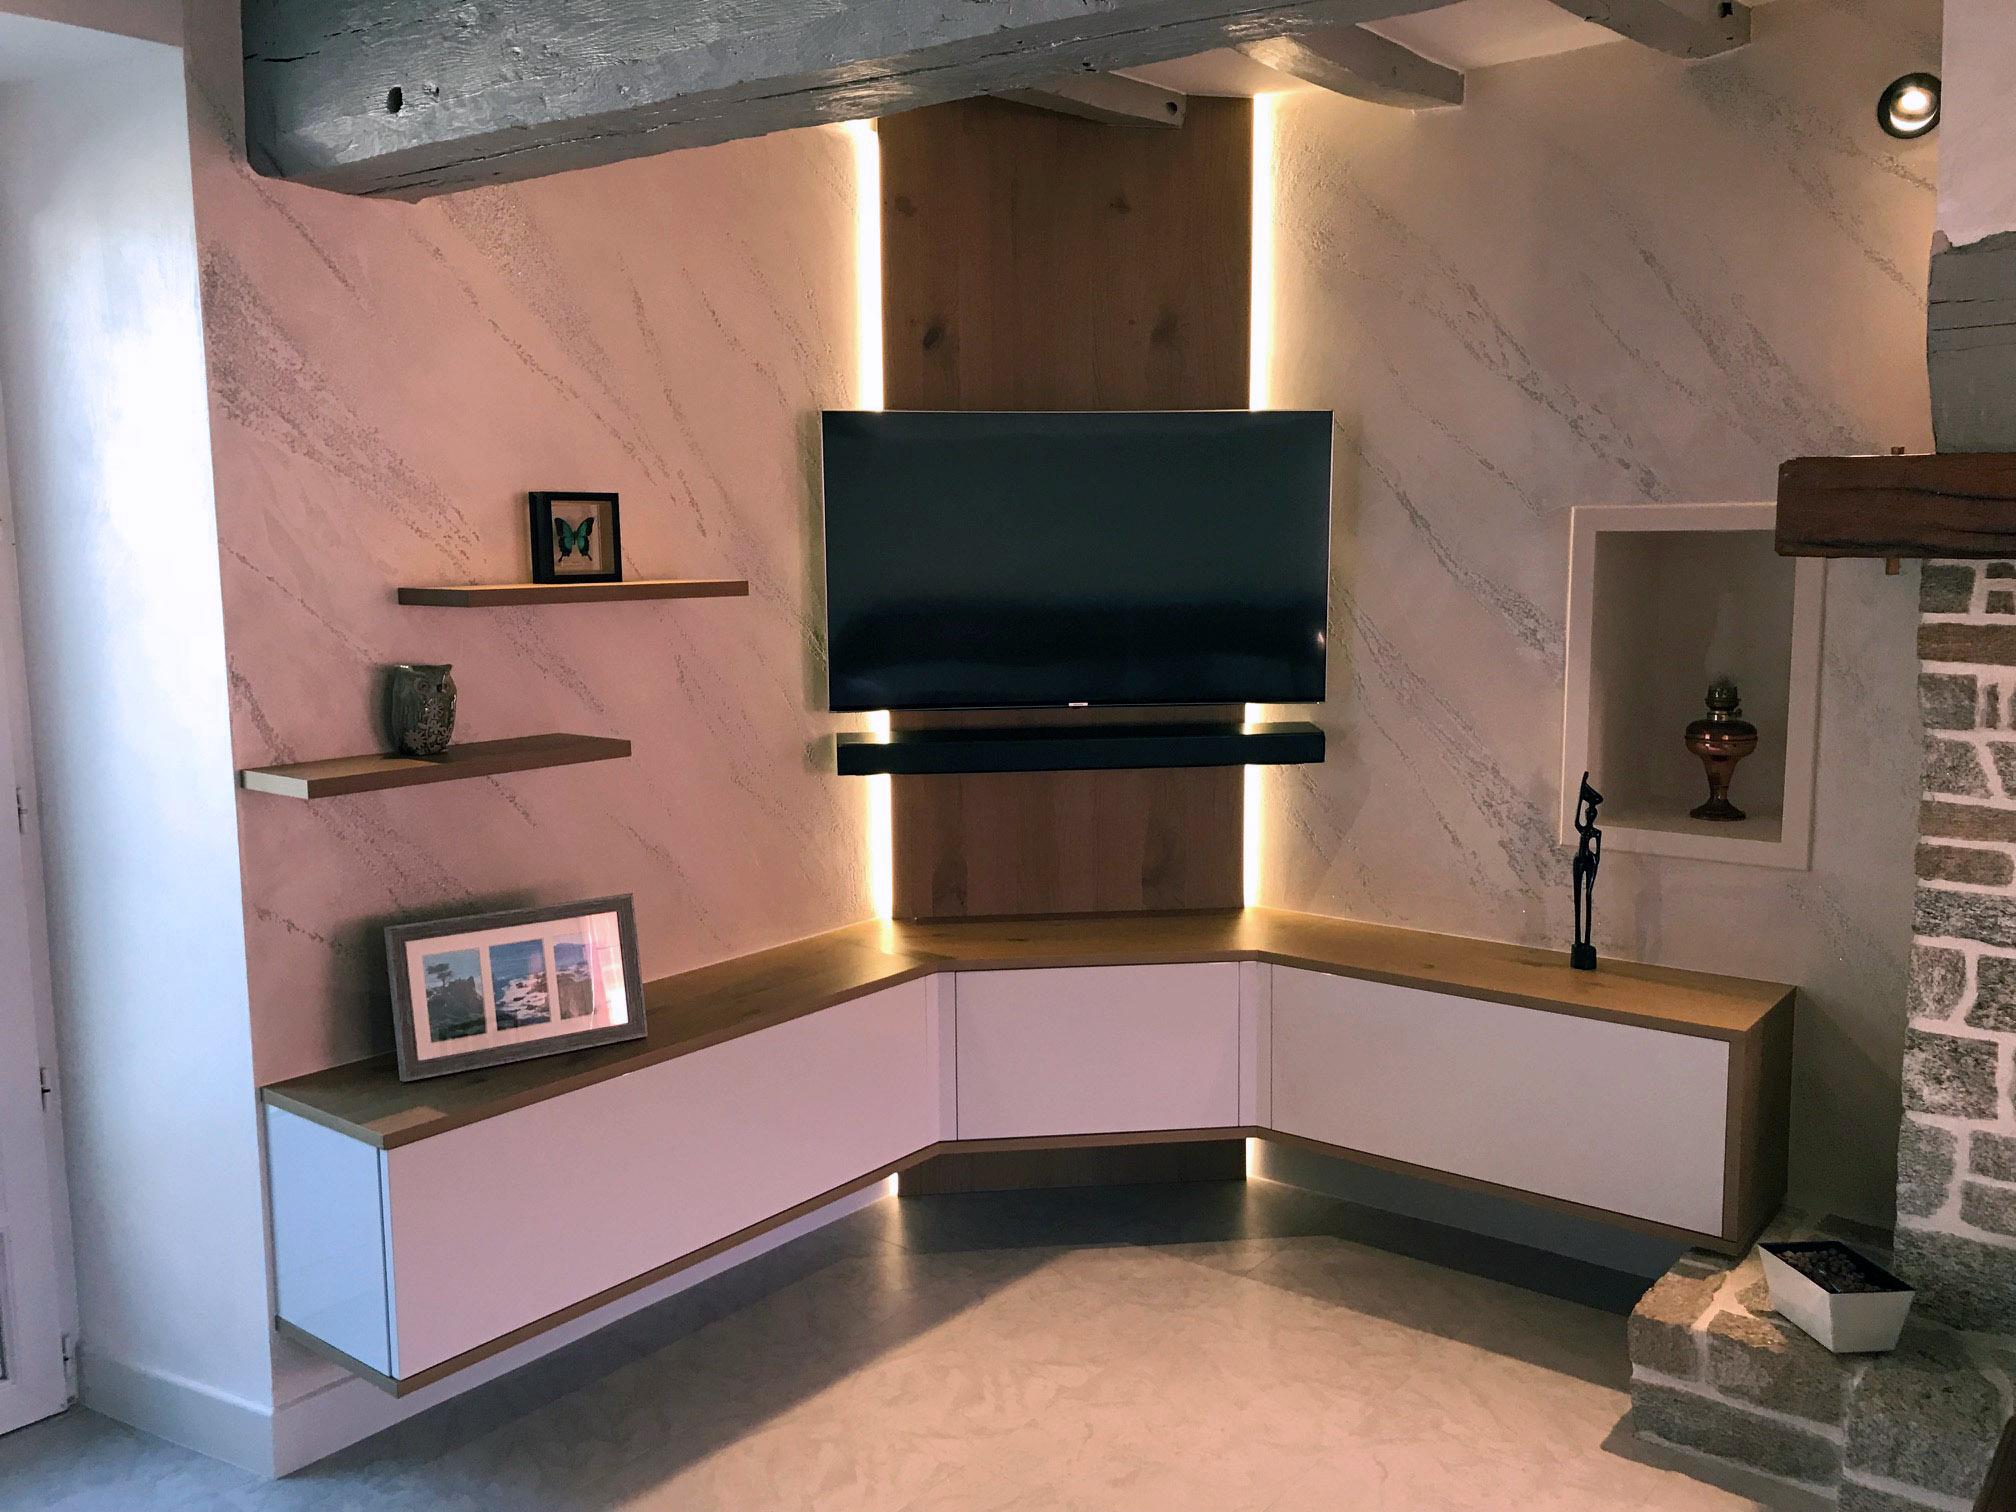 Meuble Tv Angle Suspendu meuble d angle salon design - kumpalo.parkersydnorhistoric